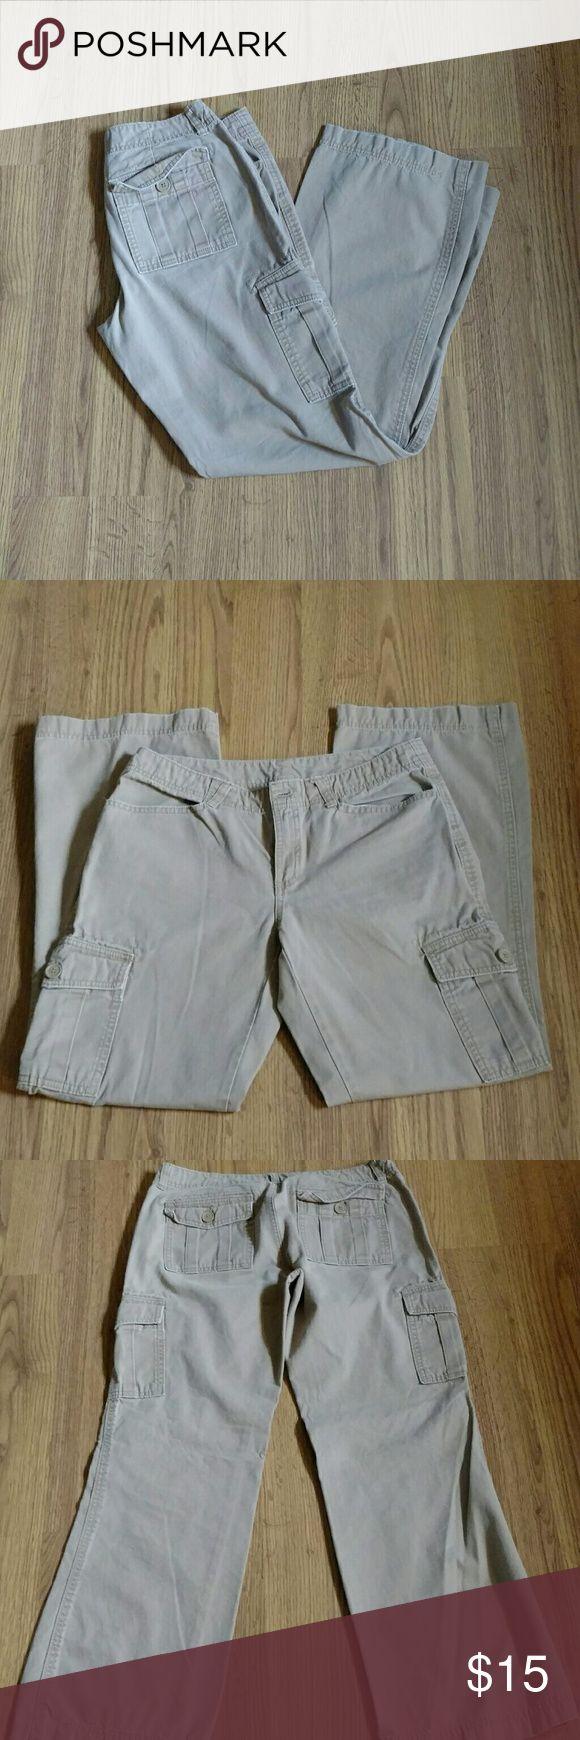 Old Navy cargo pants Womens Kahki cargo pants. EUC Very minor wear to one leg hem see last pic. Old Navy Pants